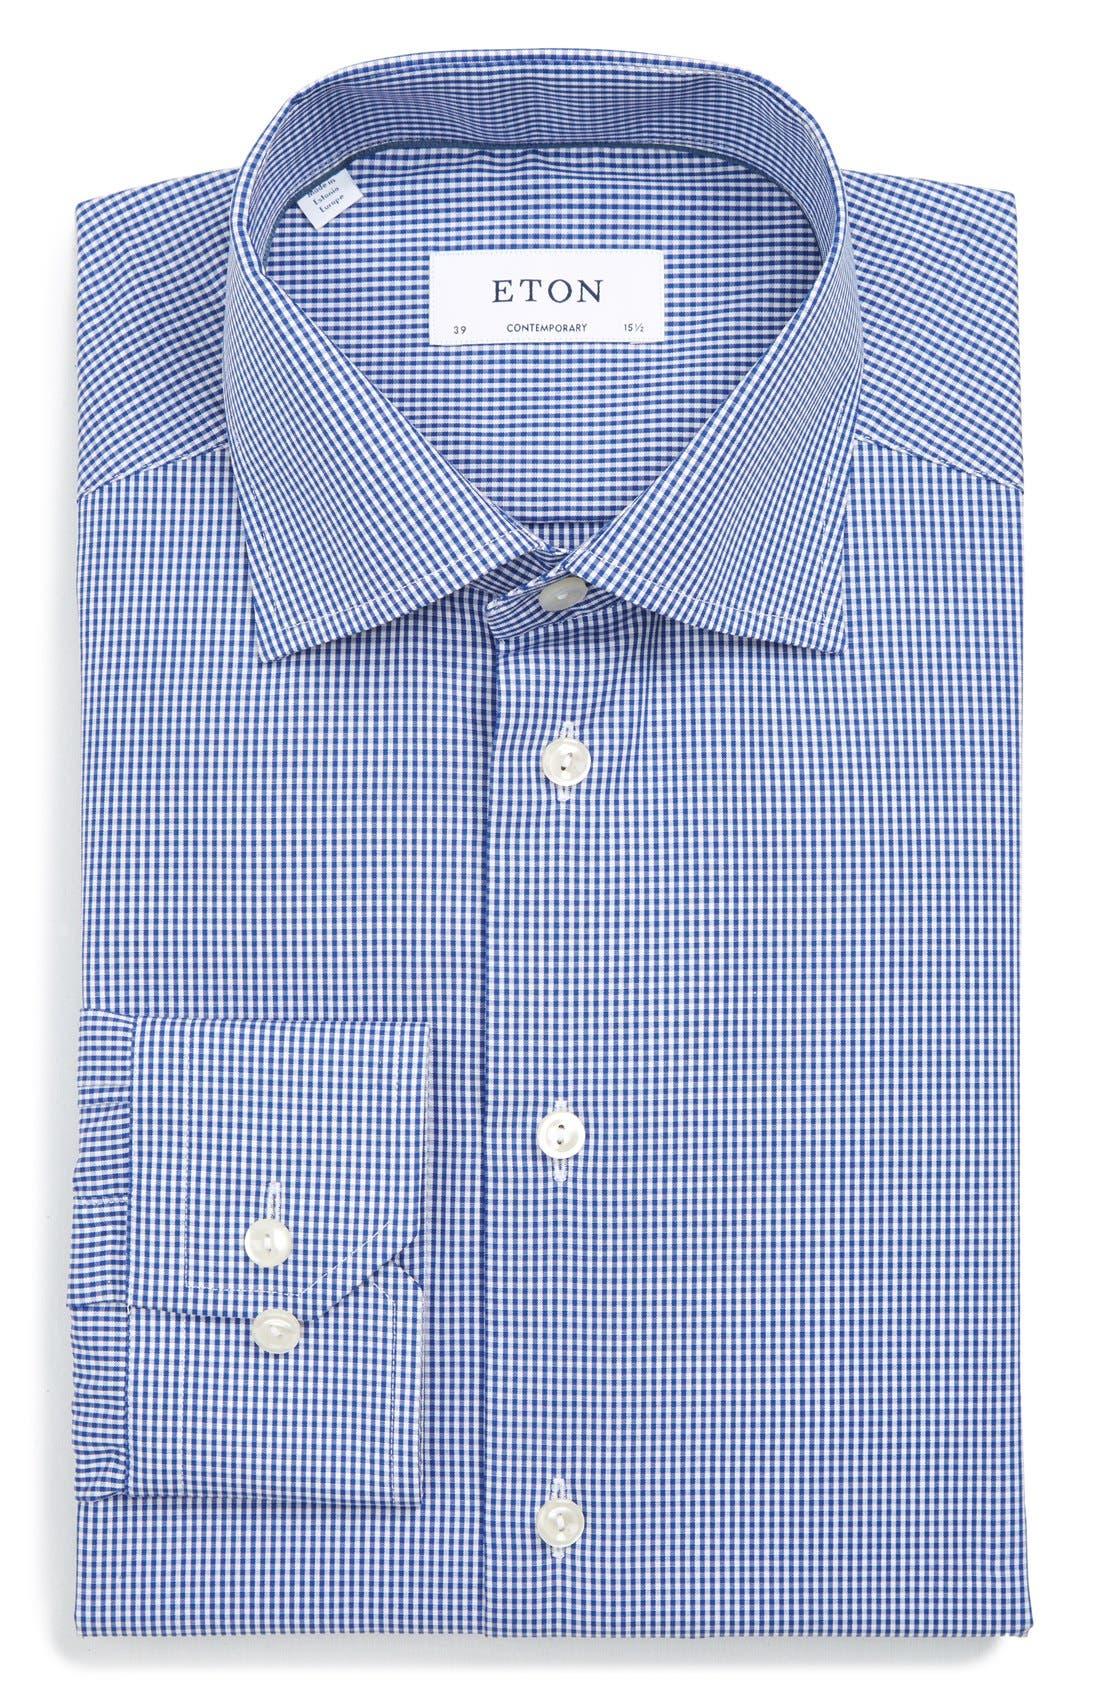 ETON OF SWEDEN Of Sweden Mini Gingham Check Regular Fit Dress Shirt in Mid Blue